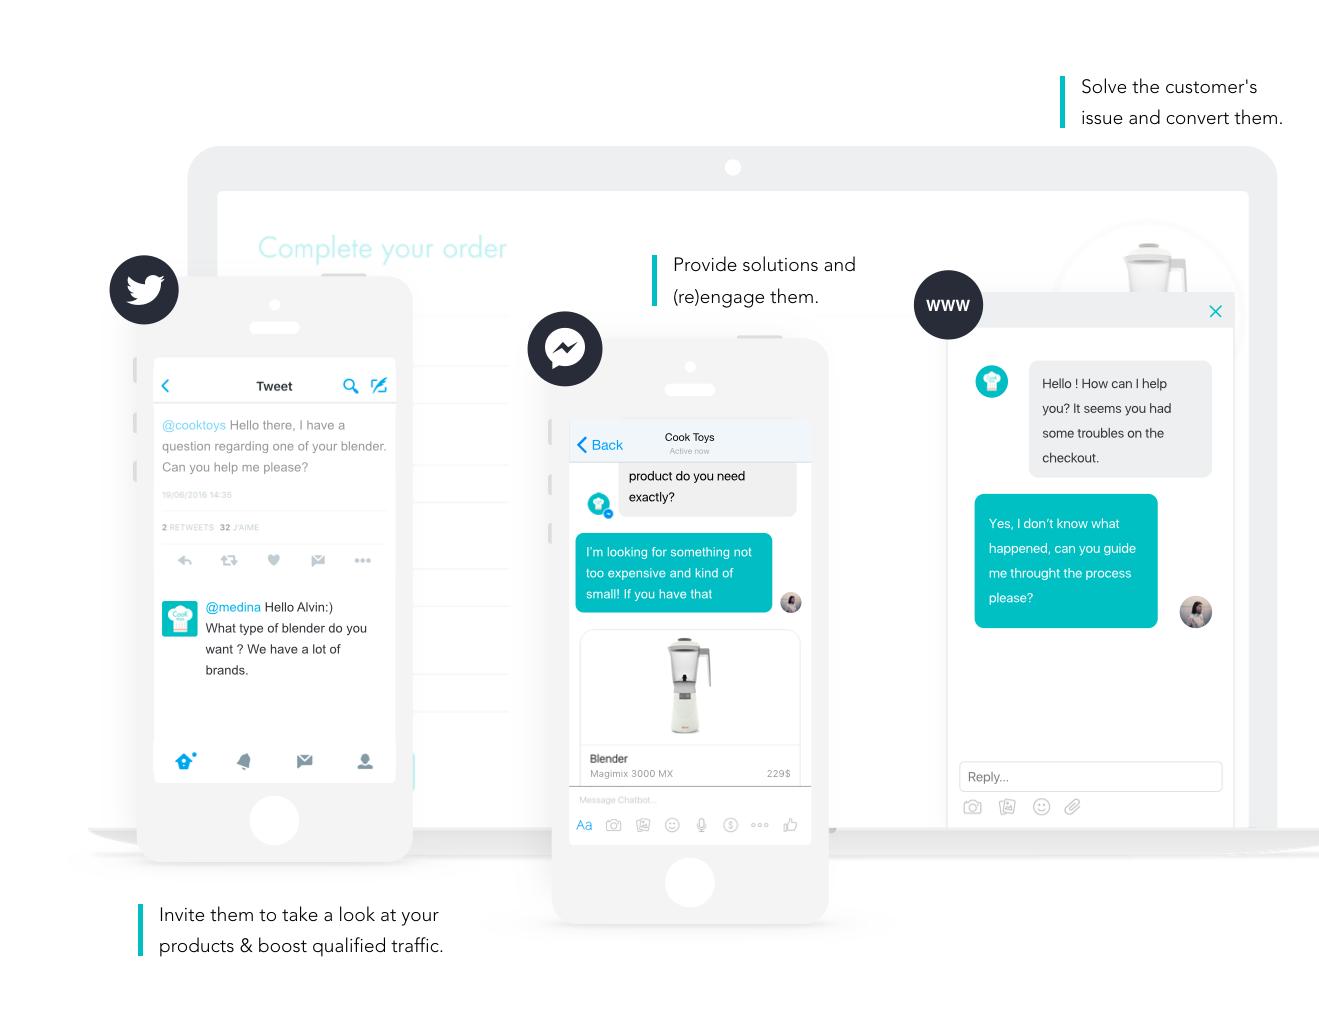 iAdvize Demo - Customer interface